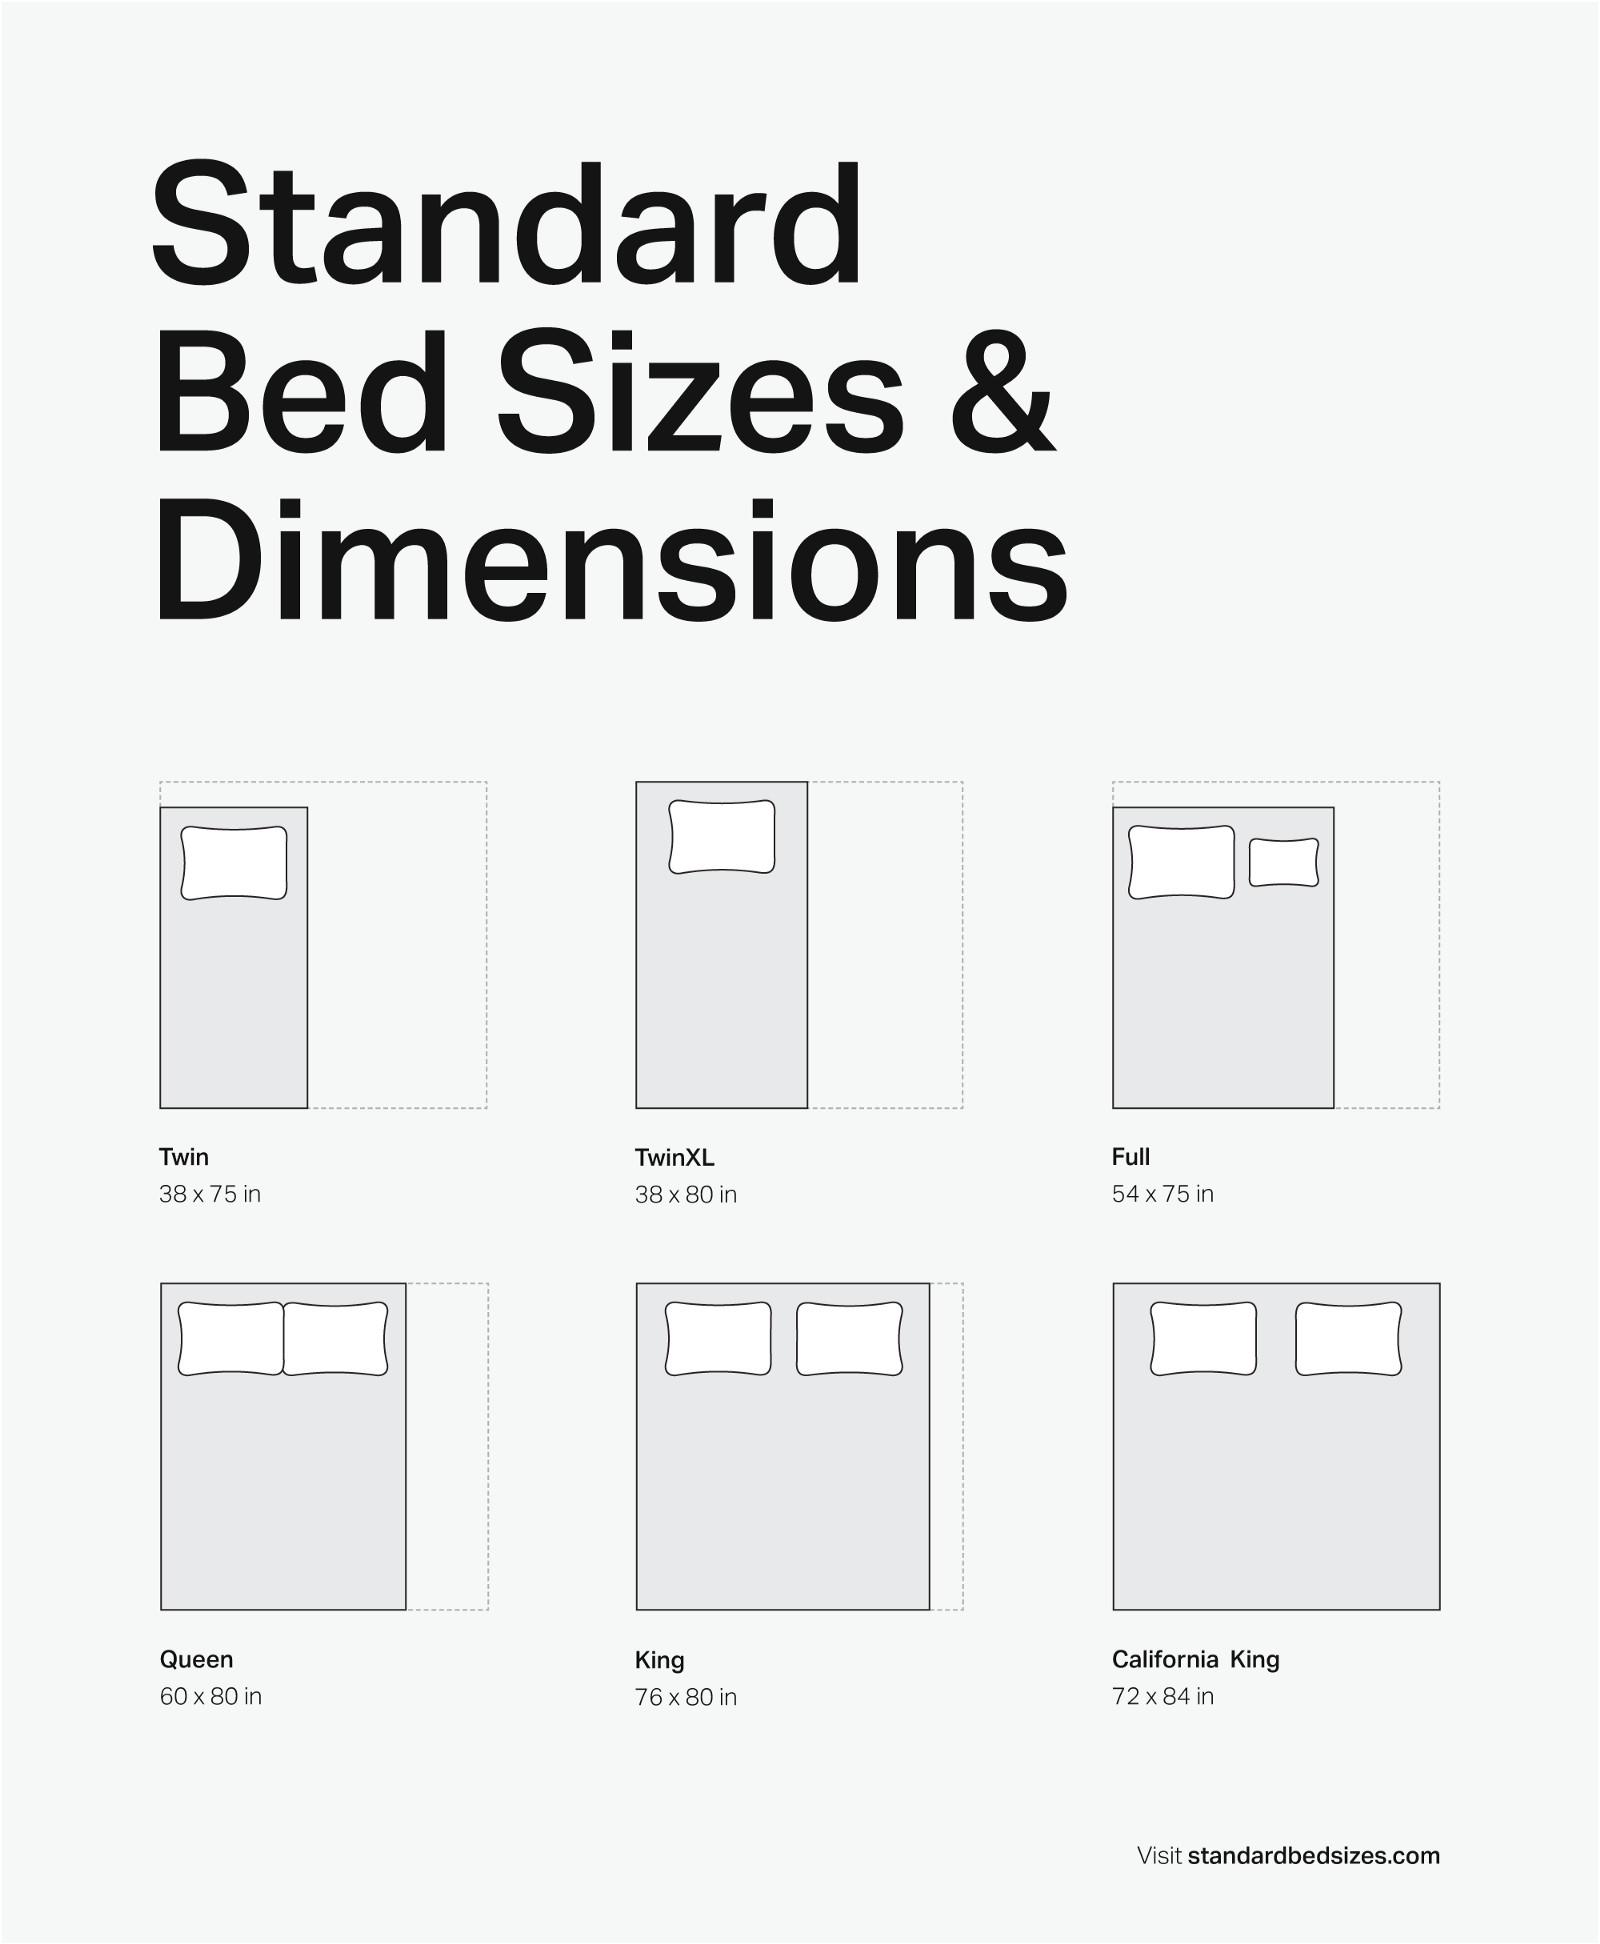 full size of us bed sizes chart dimensions prajesh sudhakar medium vs australia 1mtxqfh7vfyxhjr608 cm twin